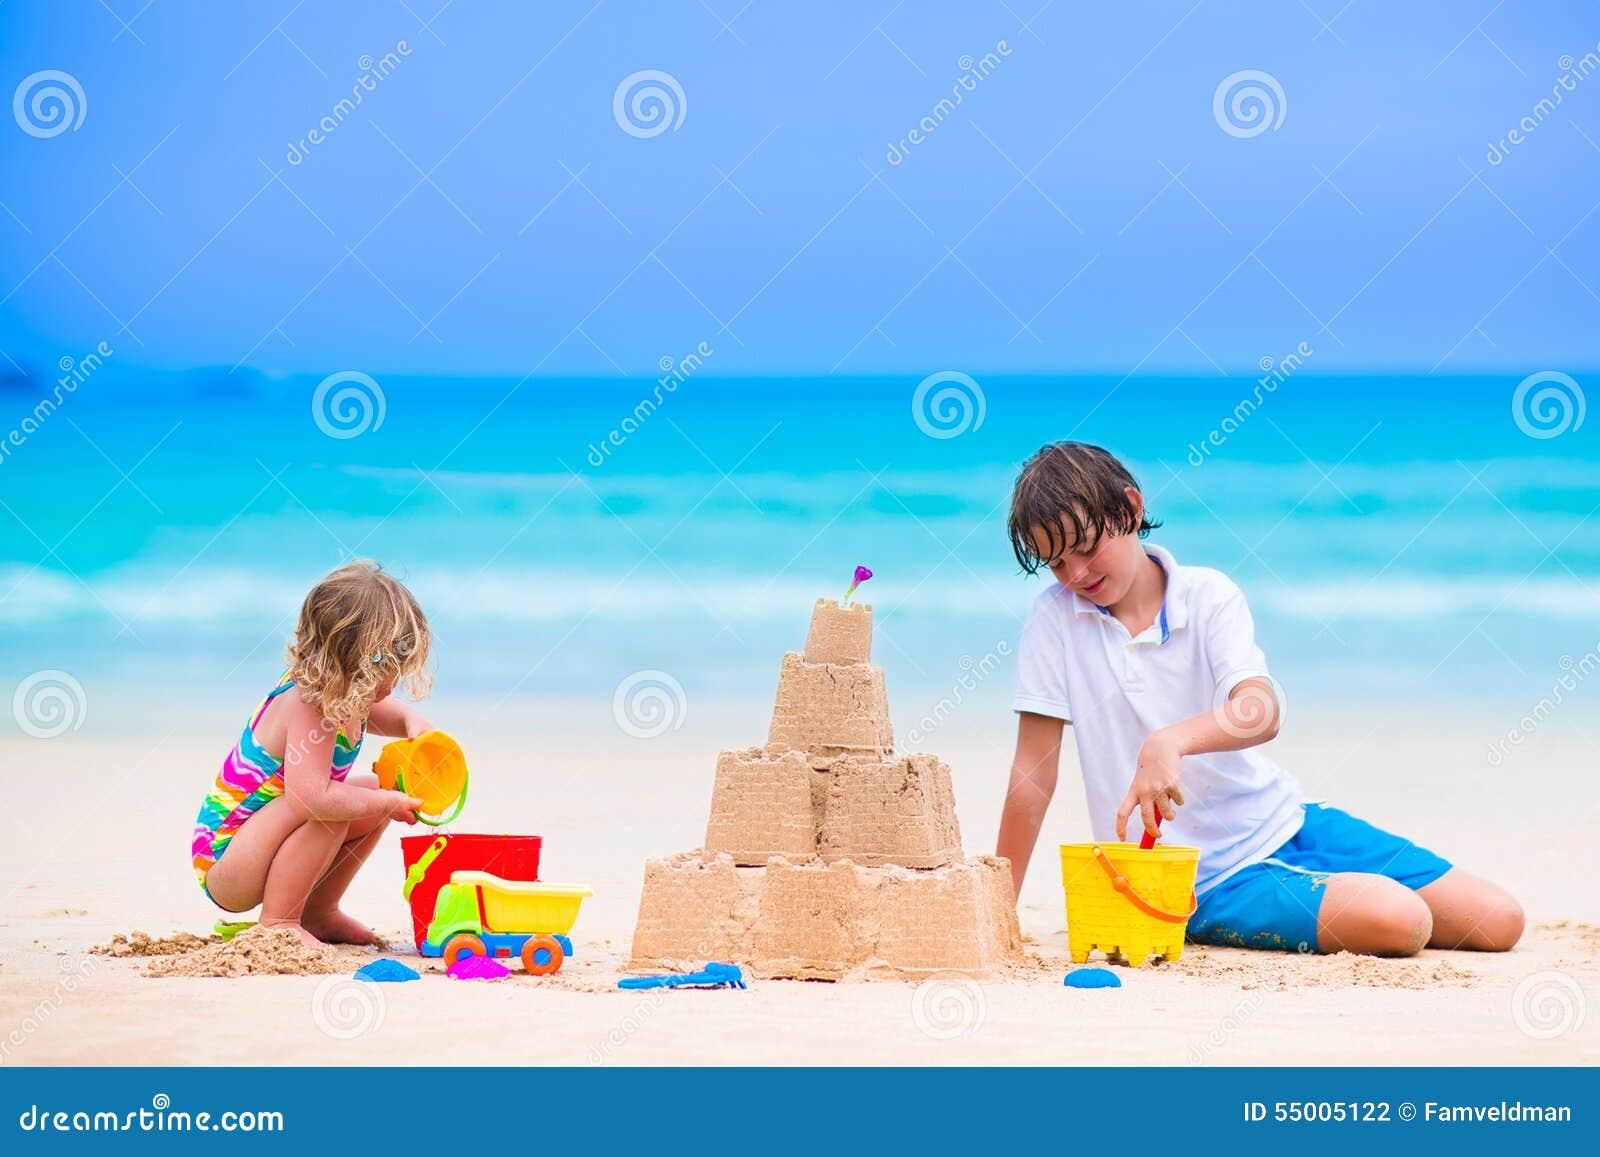 cute kids building sand castle on the beach stock photo clip art vocational clip art vocational